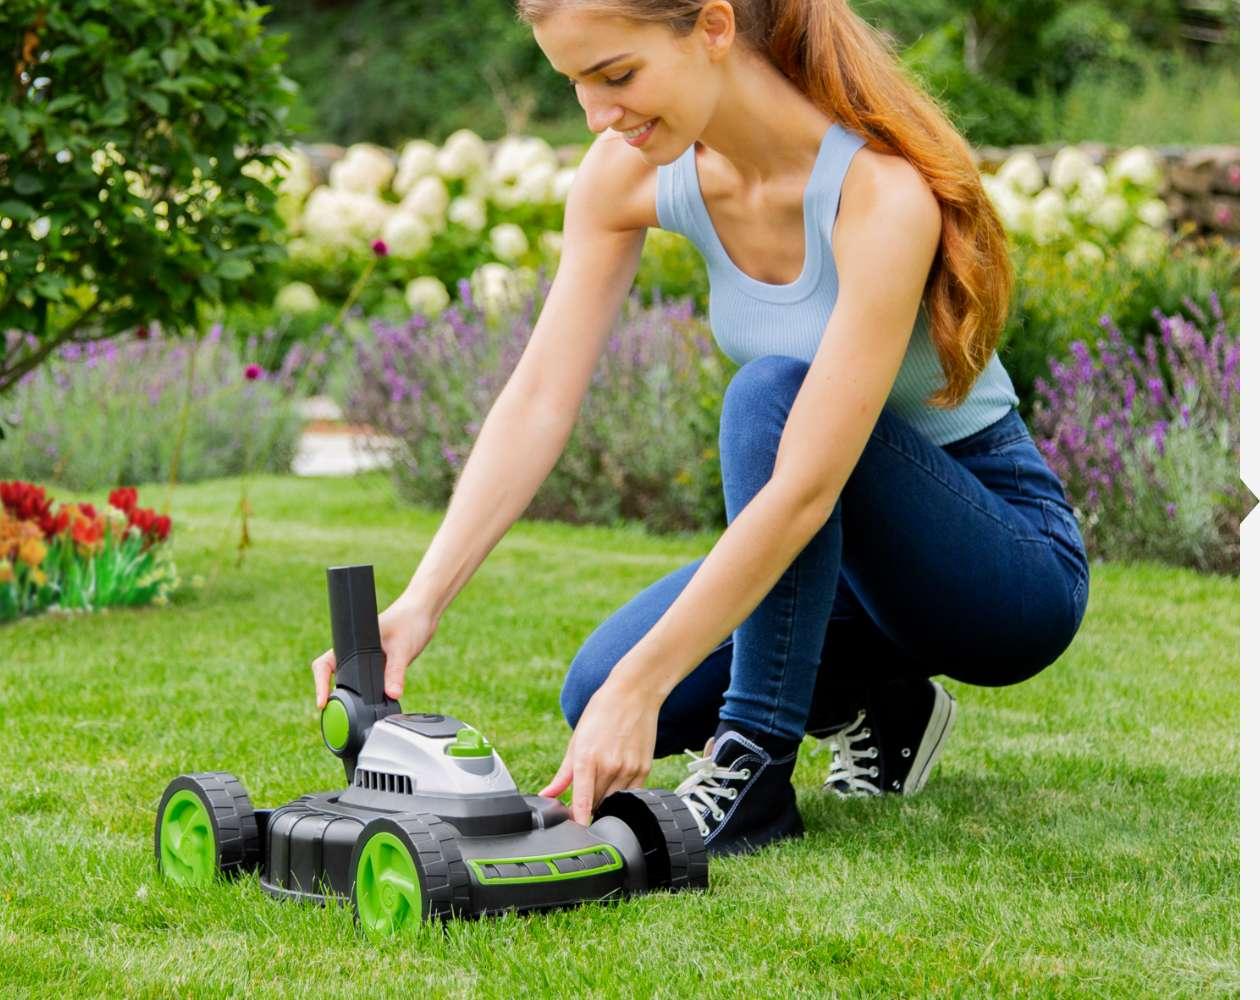 Woman lifting compact lawn mower